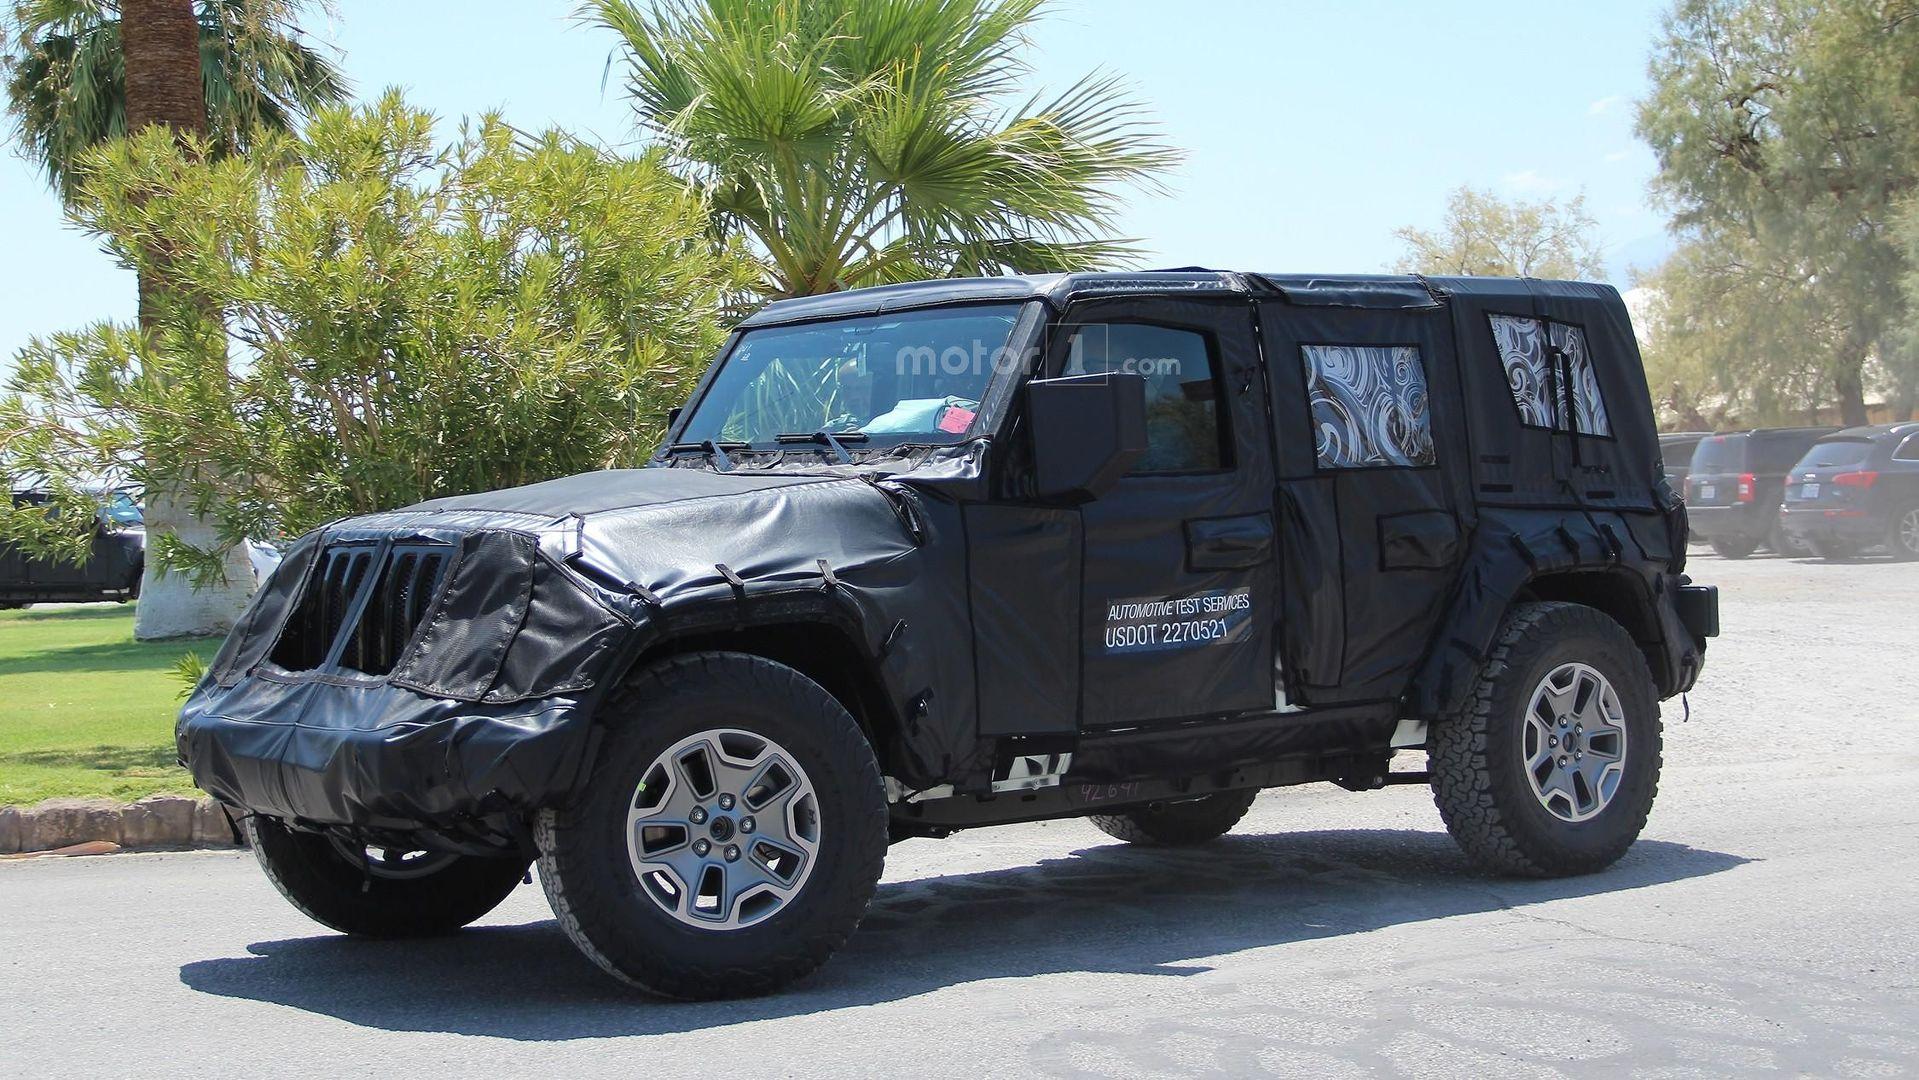 2018 Jeep Wrangler hides evolutionary design underneath thick camo